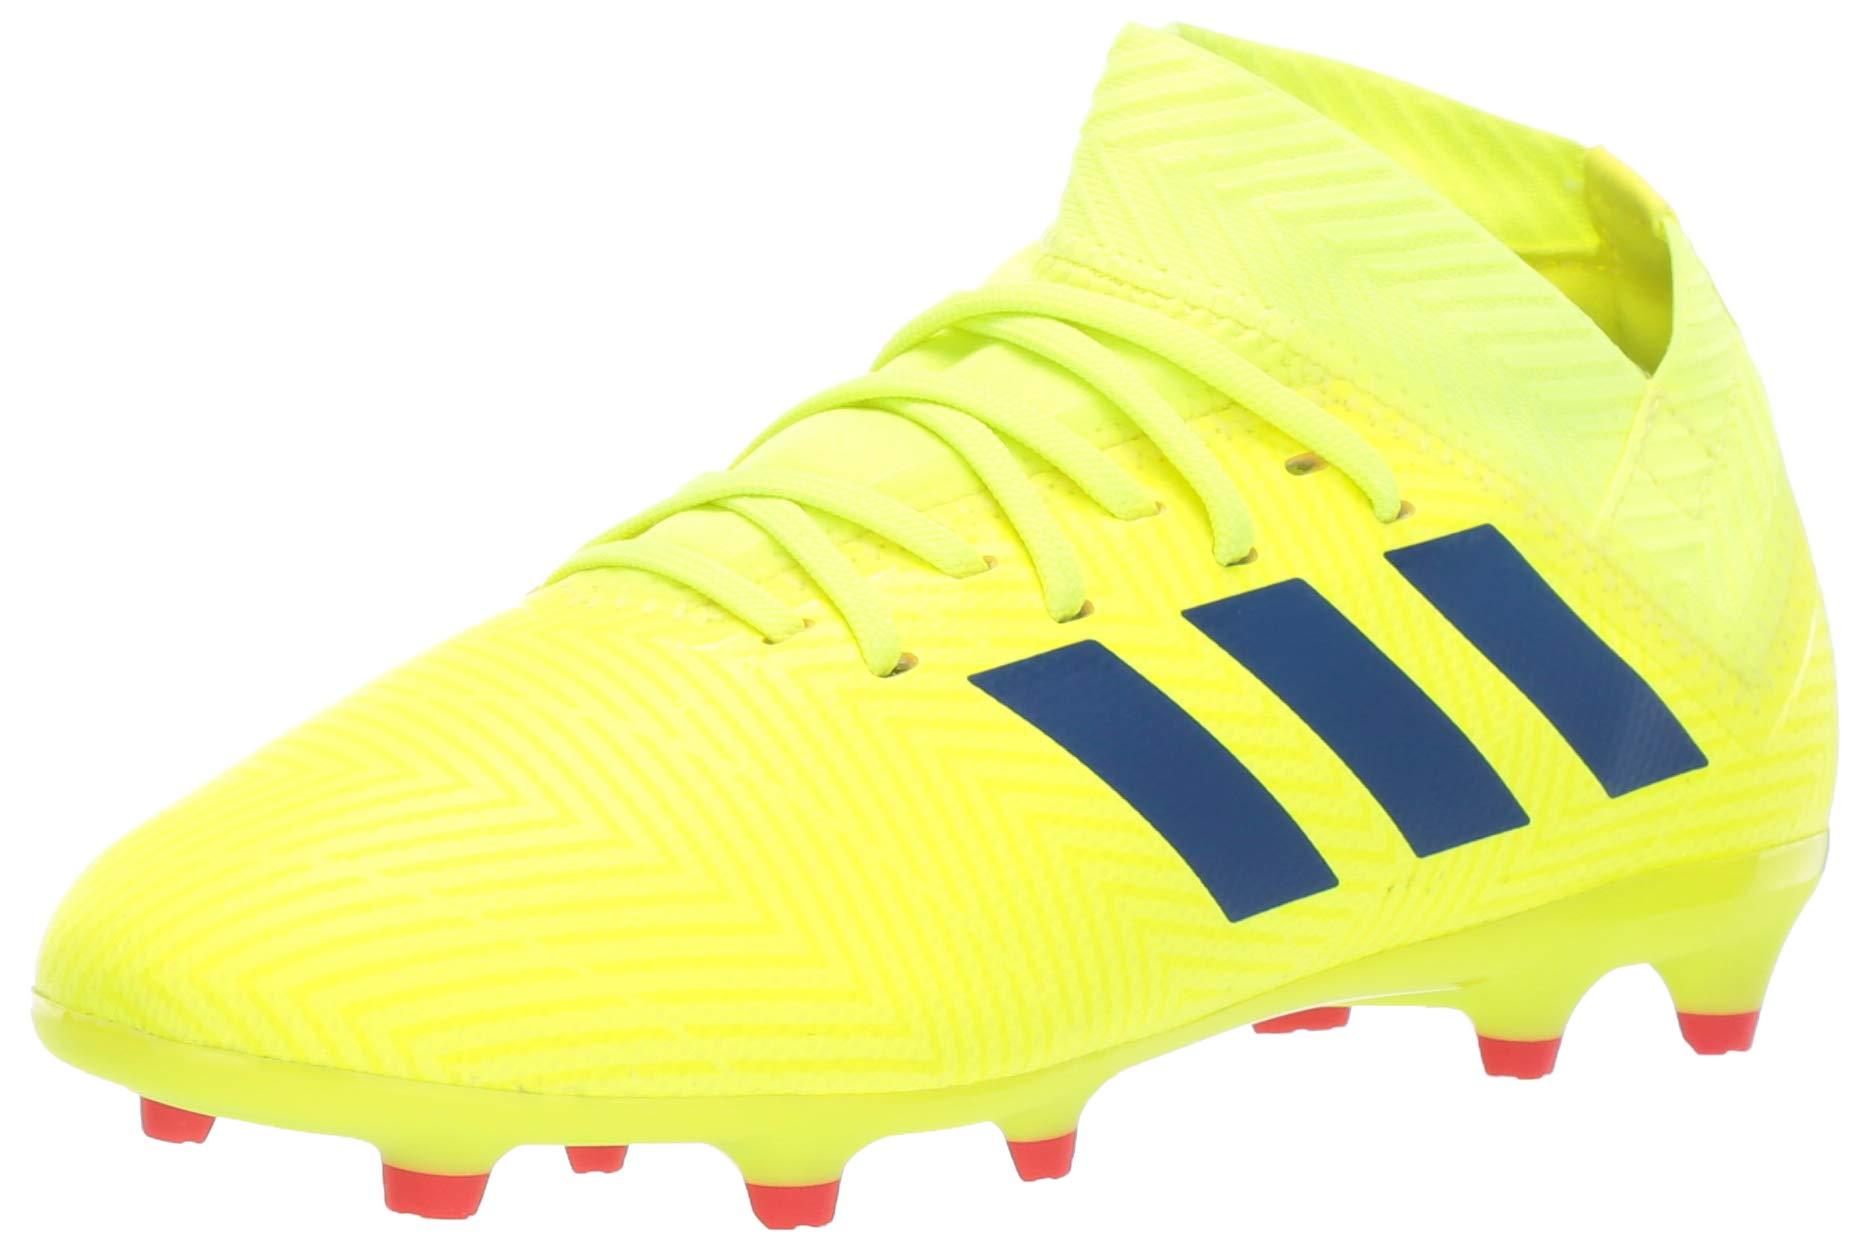 adidas Unisex Nemeziz 18.3 Firm Ground, Solar Yellow/Football Blue/Active red, 6 M US Big Kid